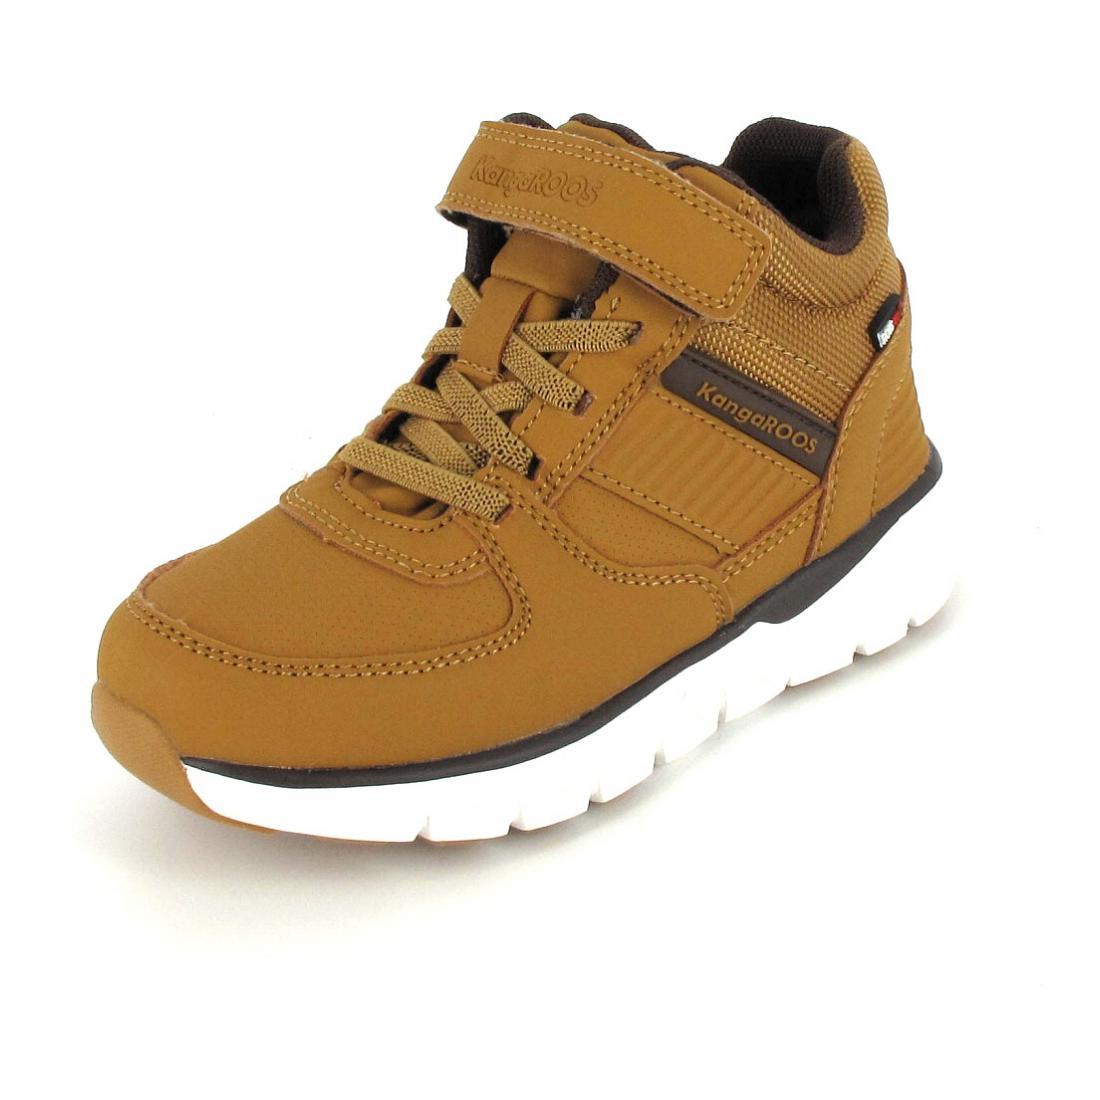 KangaRoos Sneaker high K-TS CASPO EV RTX